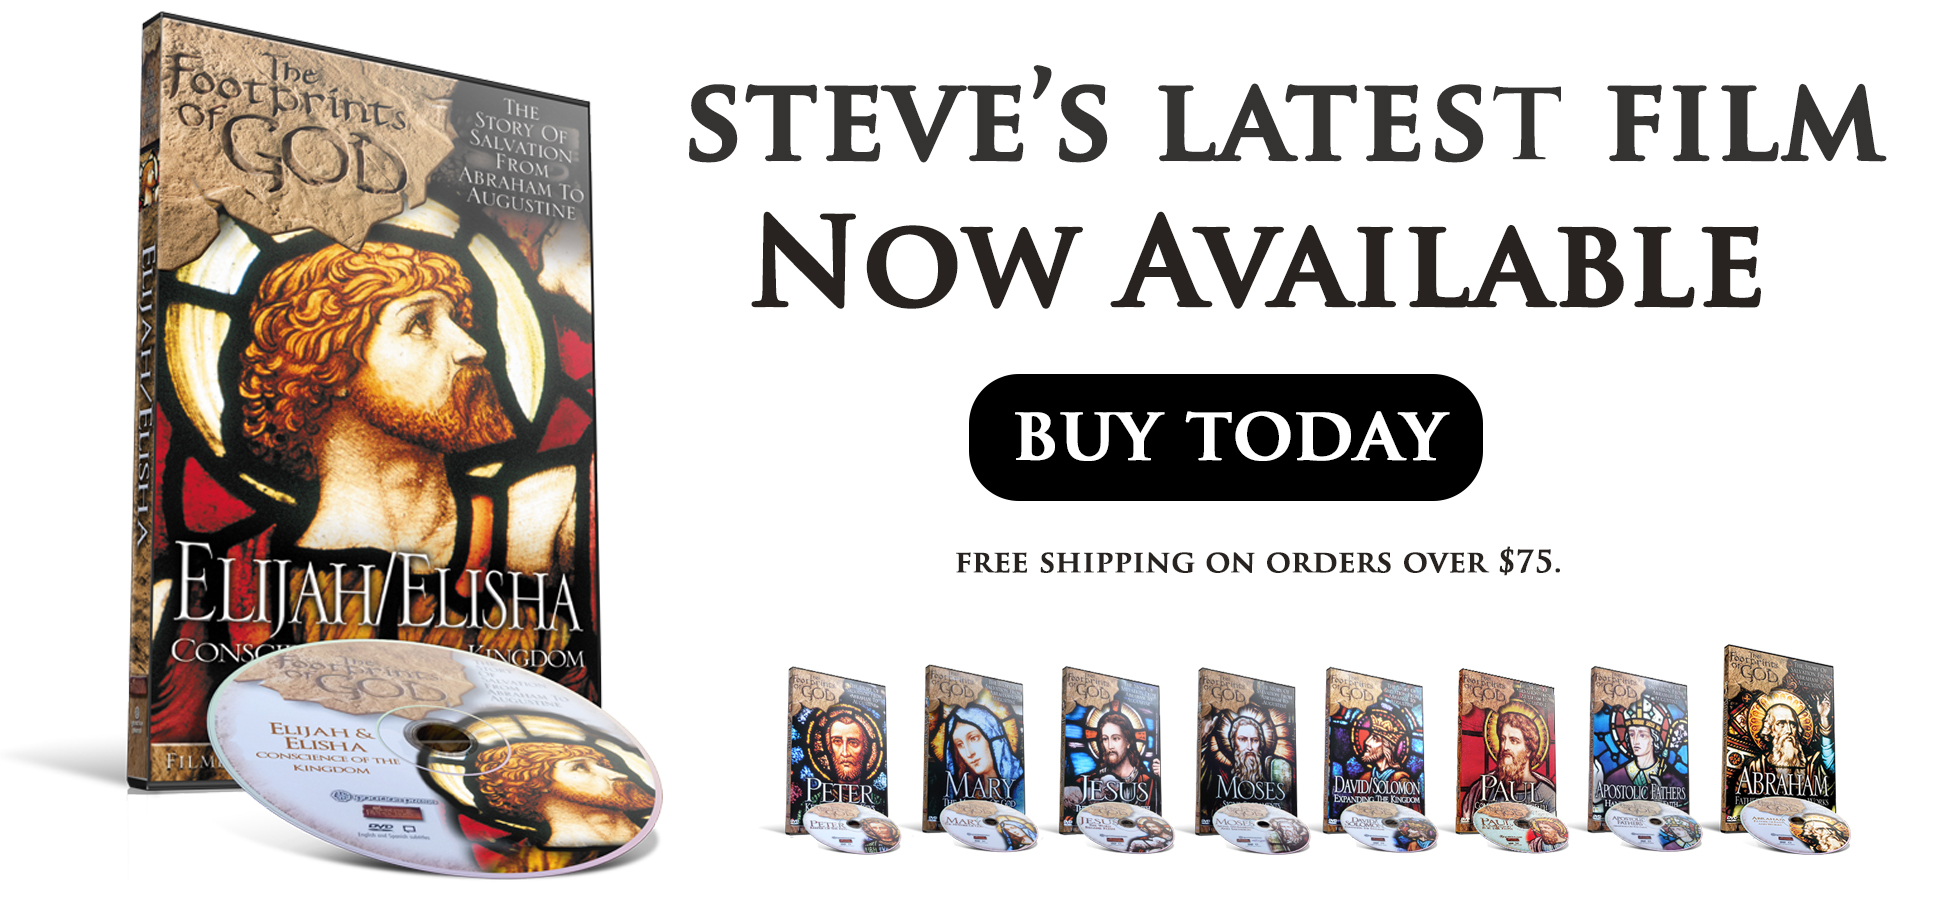 Steve's Latest Film Now Available